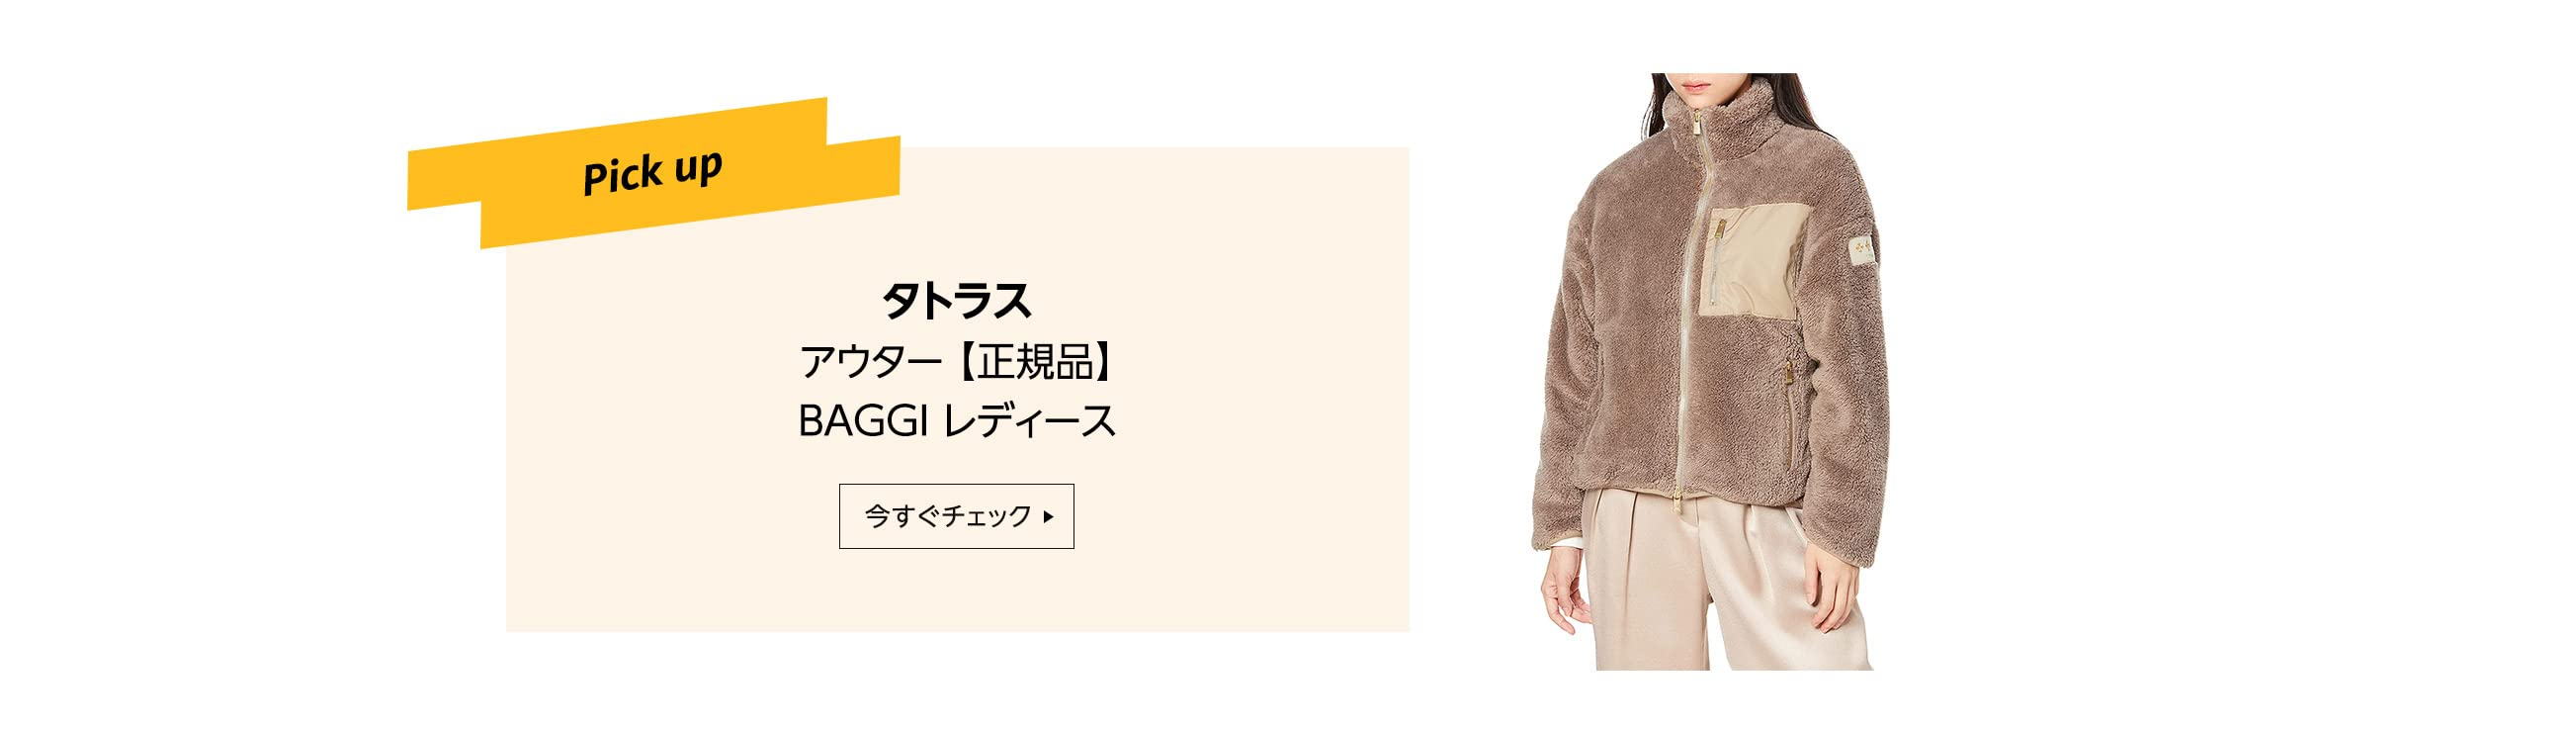 Pick up タトラス アウター【正規品】BAGGI レディース